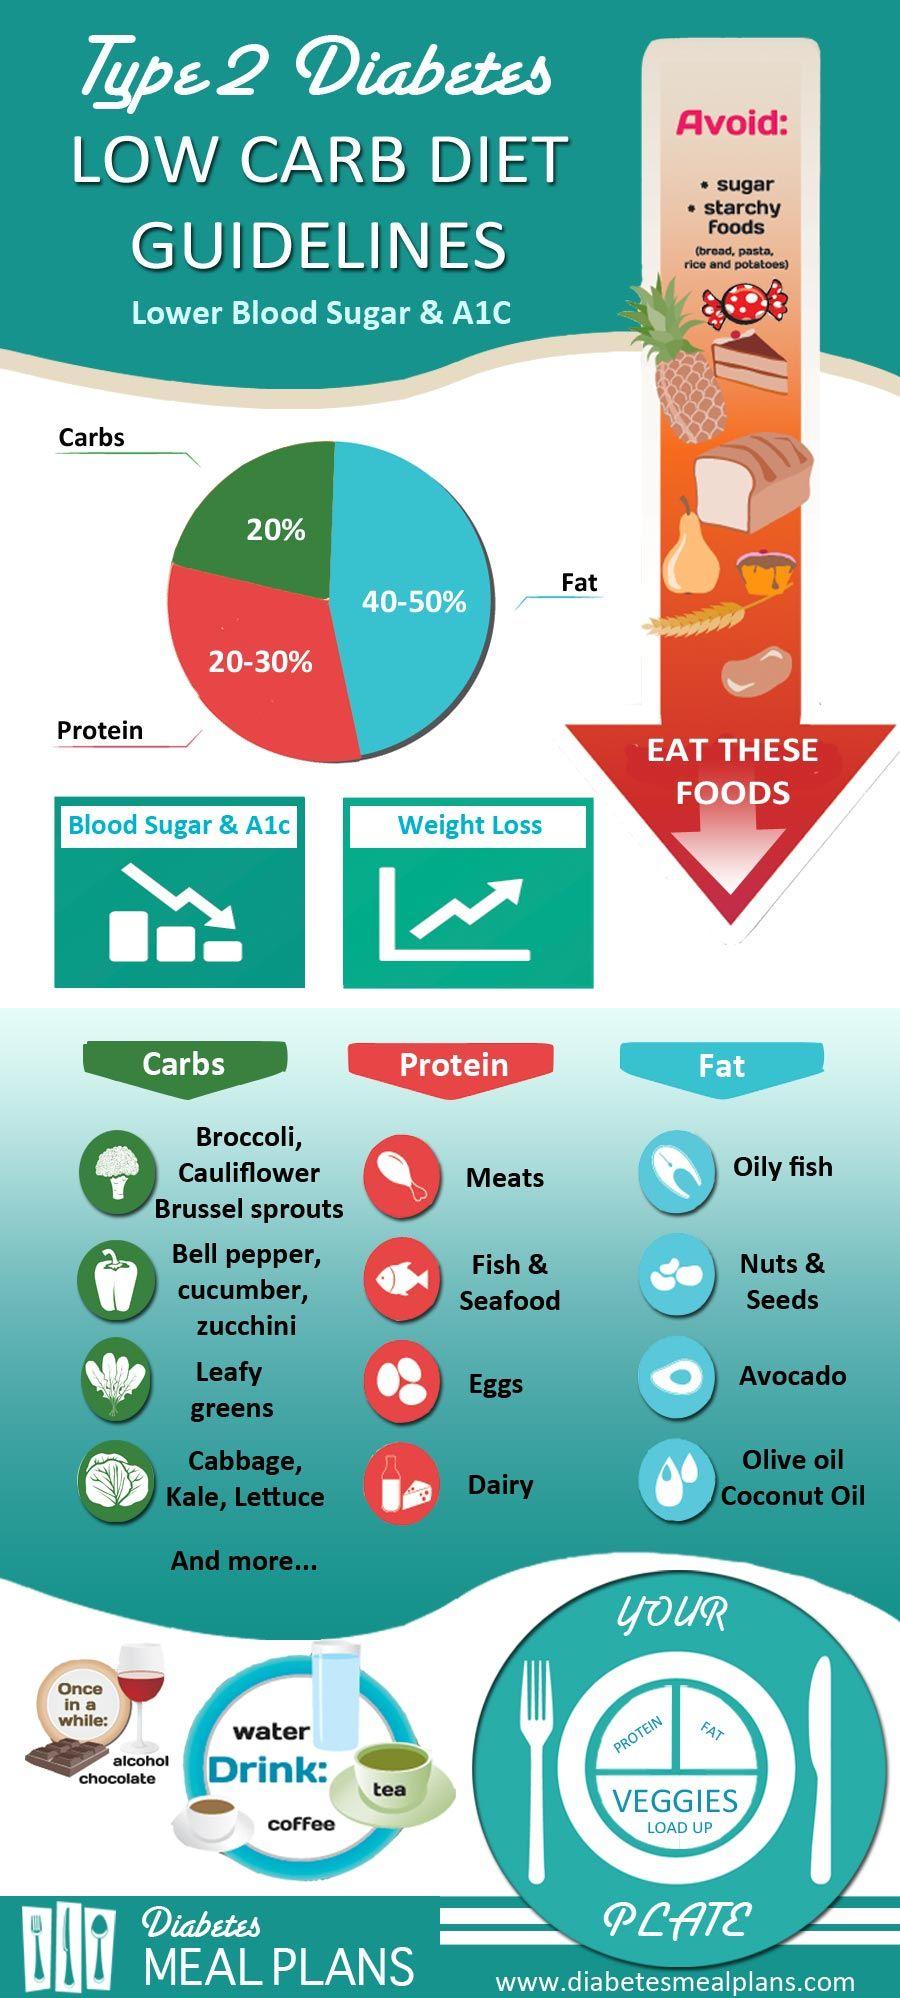 Pin on Diabetes Meal Plans Blog